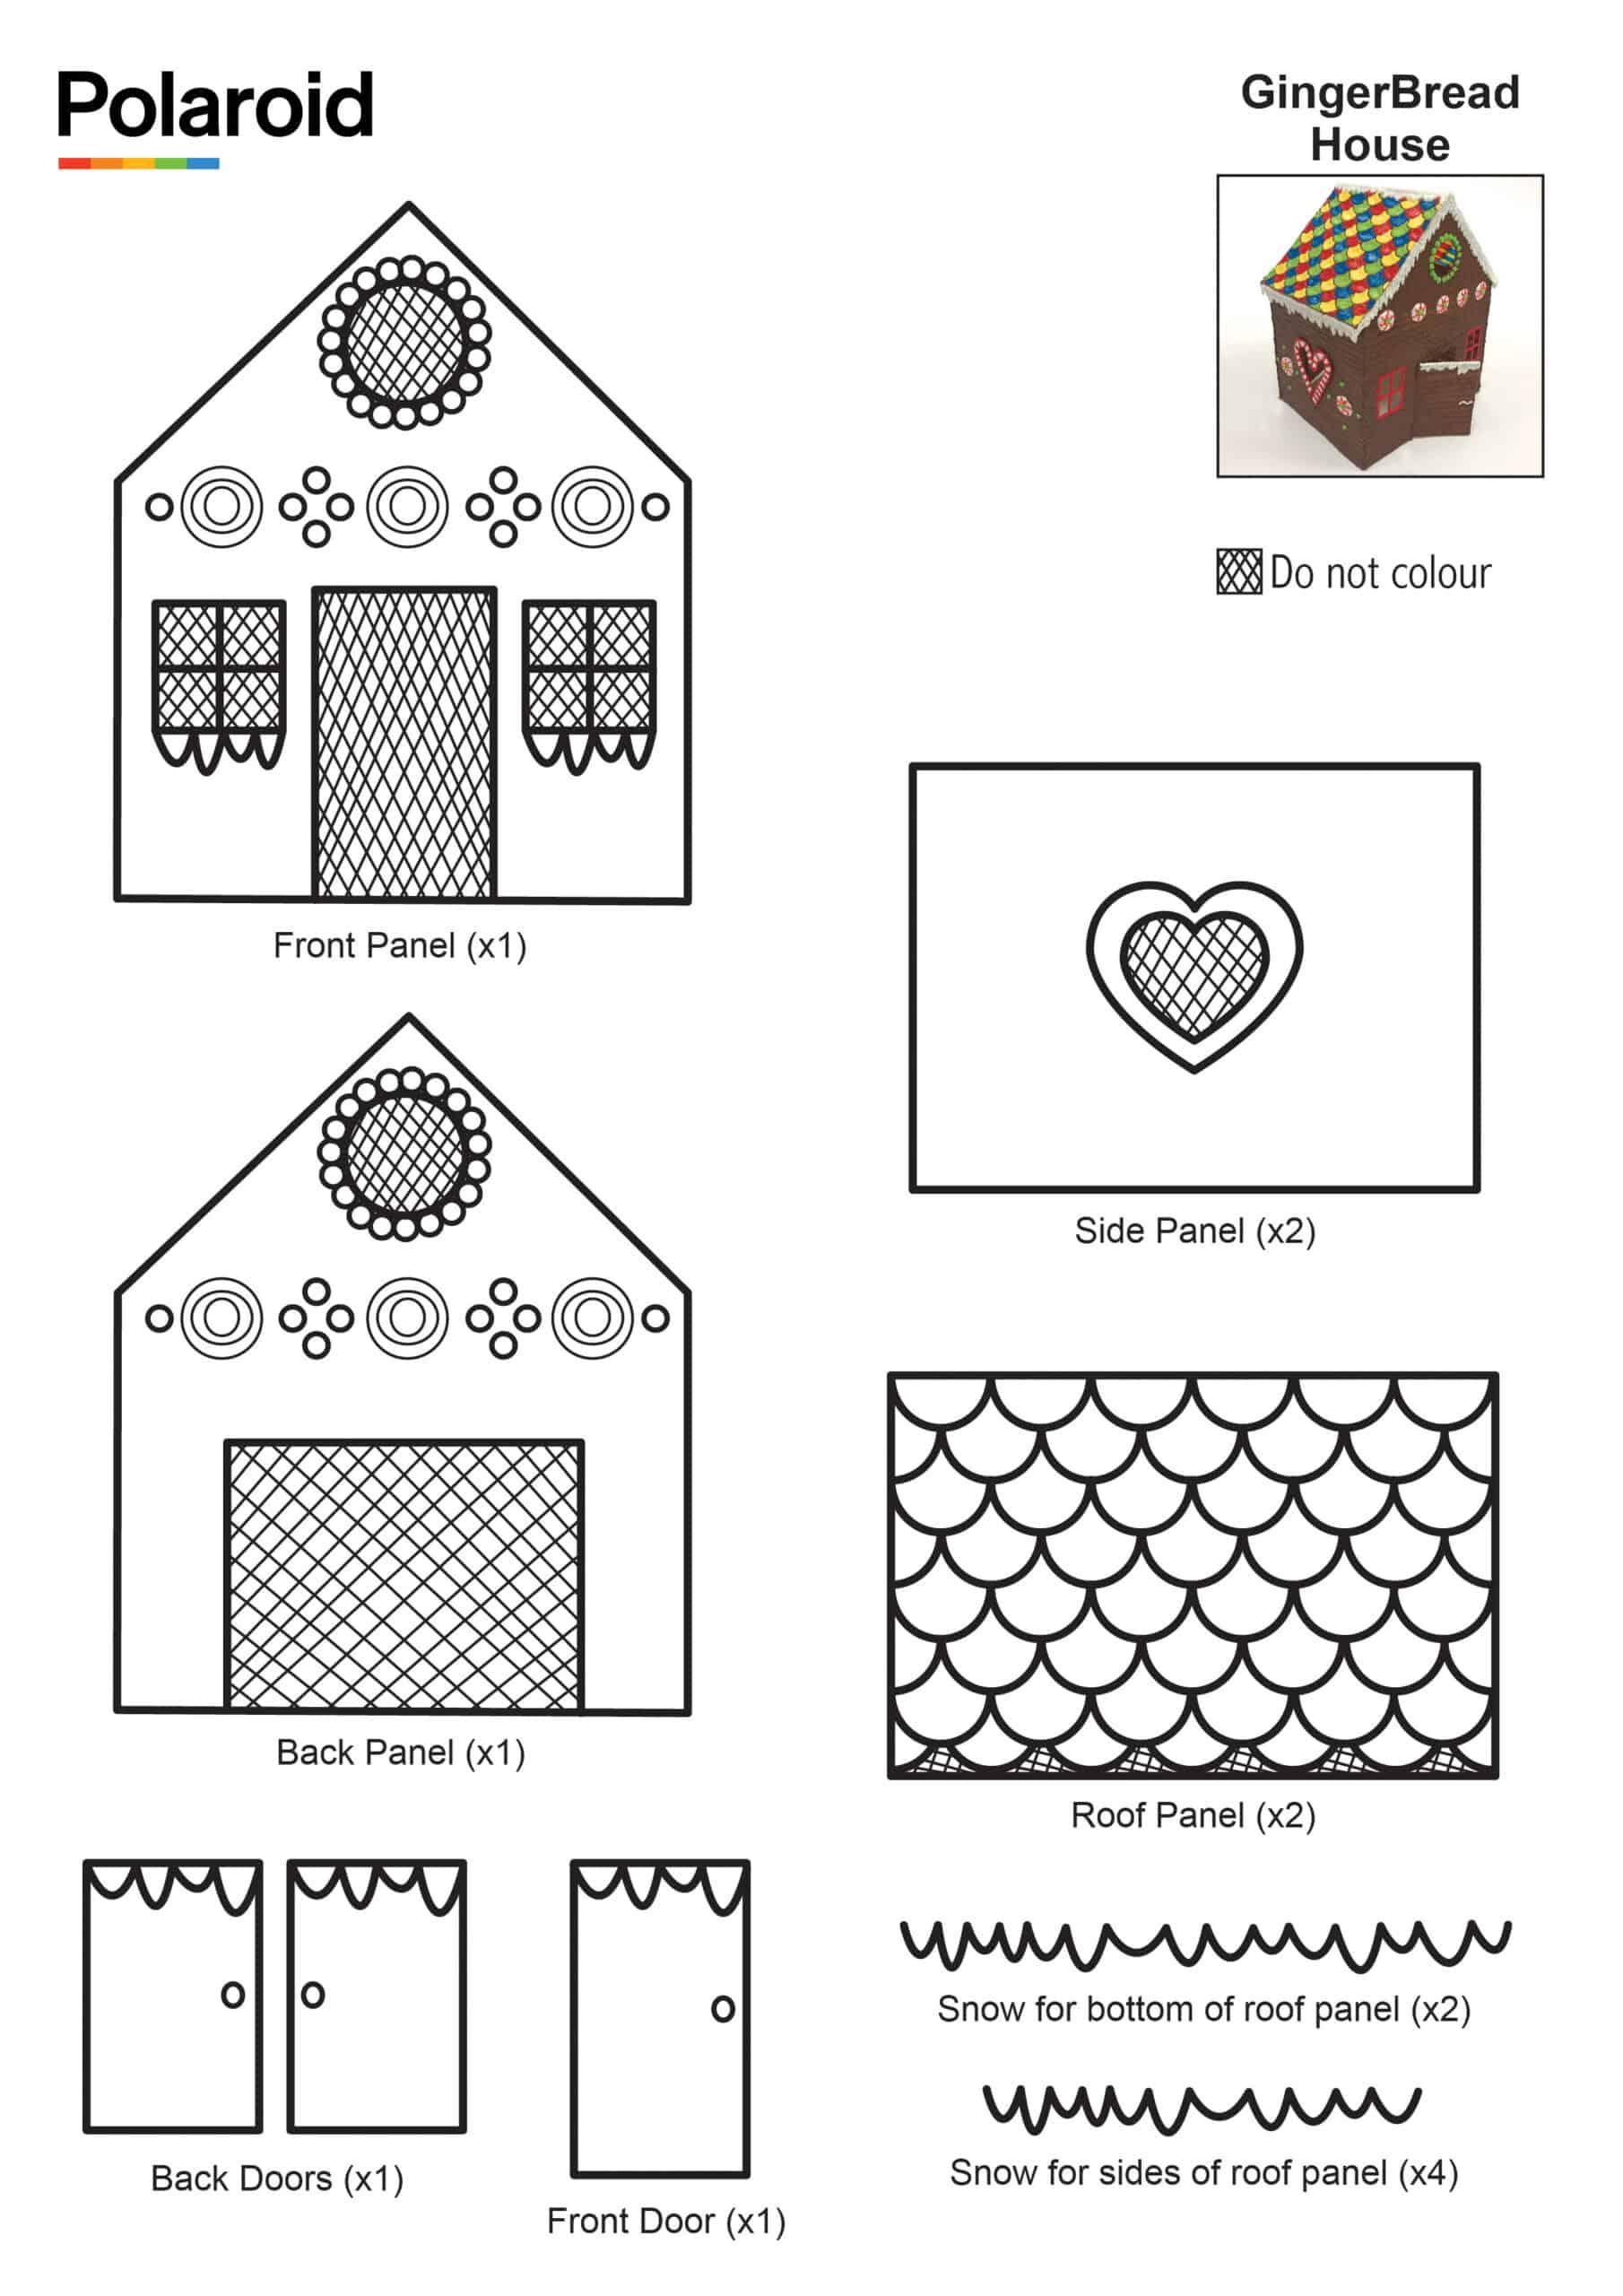 GingerBread House_New Logo